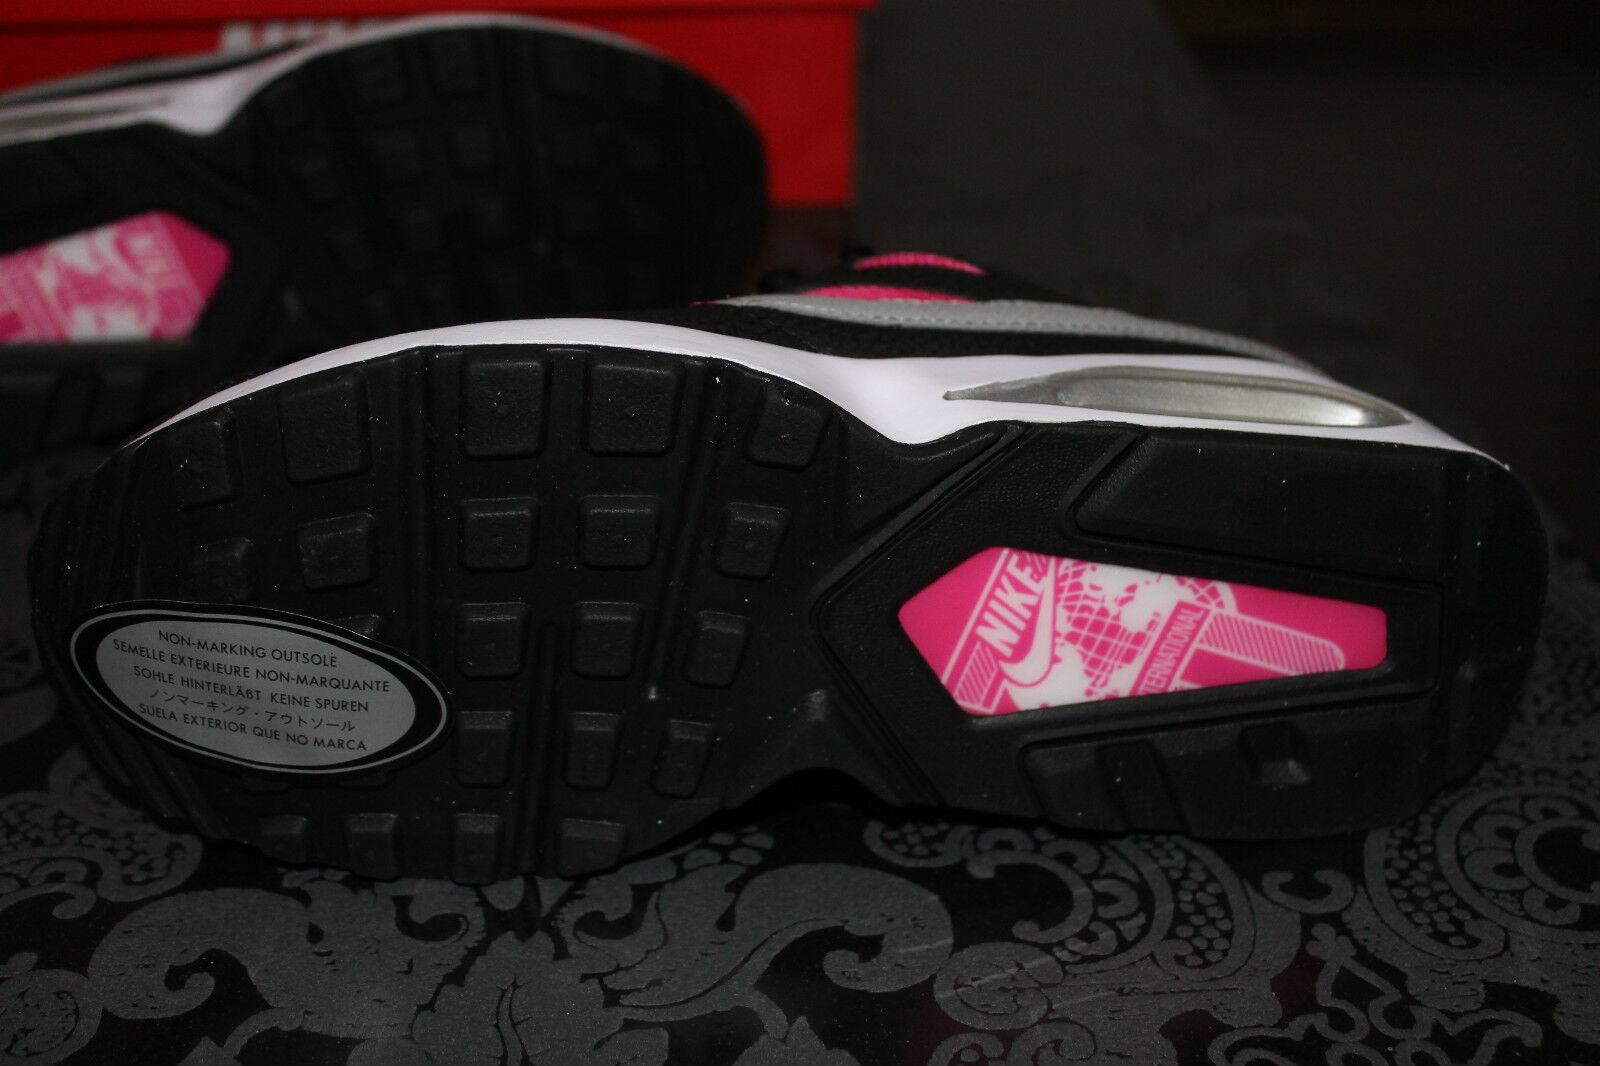 Nike Air Max FUCSIA Coliseum DONNA RUNNING SCARPE NERE FUCSIA Max TAGLIA 38 o 38,5 NUOVO 77579e